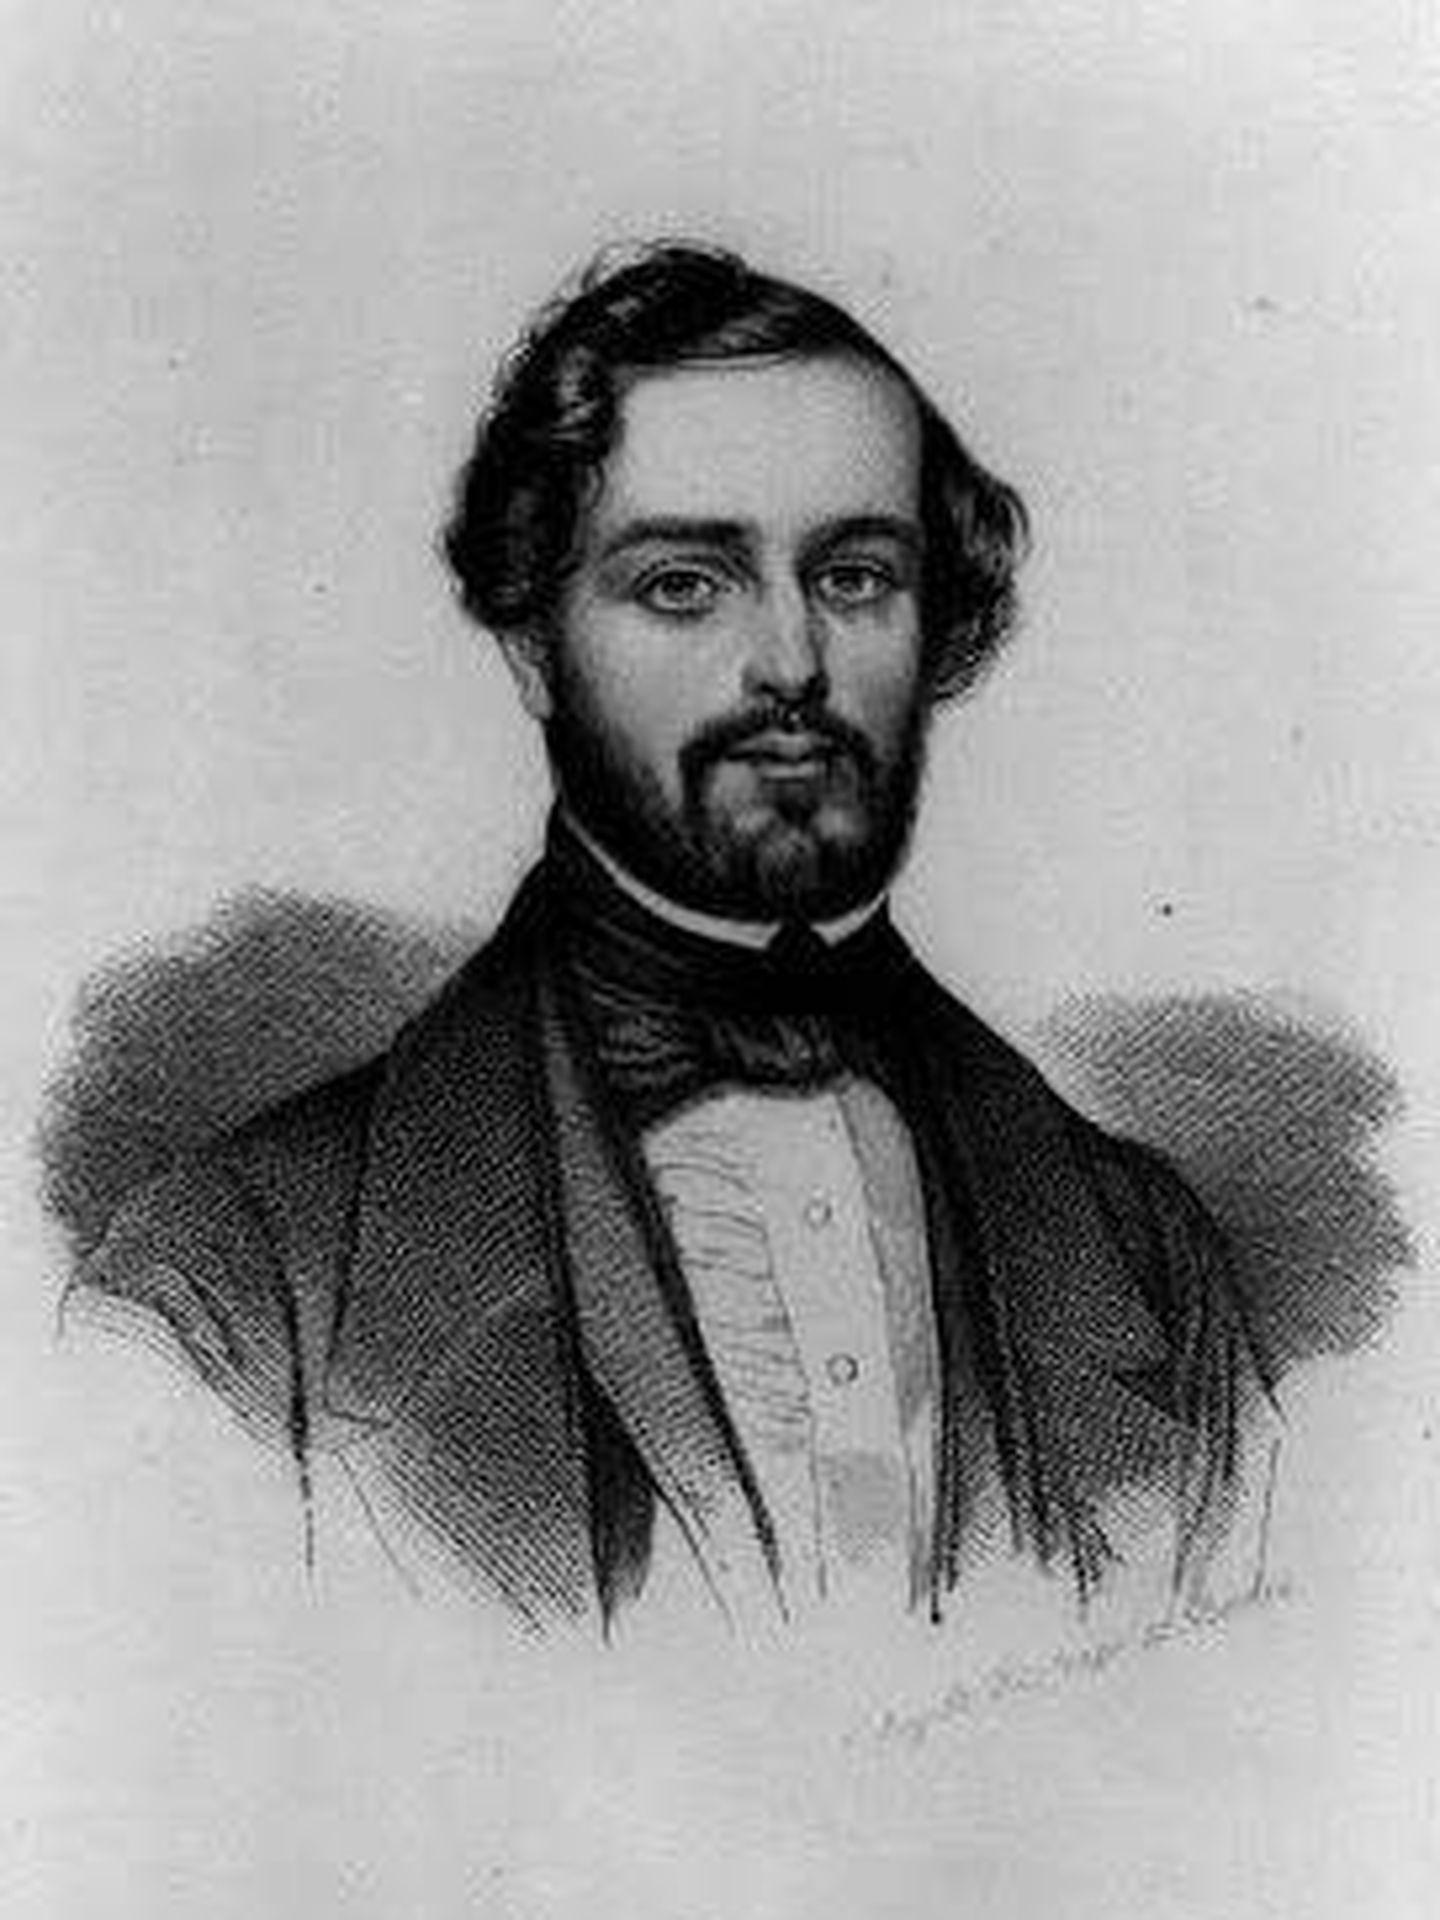 Retrato de Ignacio Gurowski. (Dominio público)